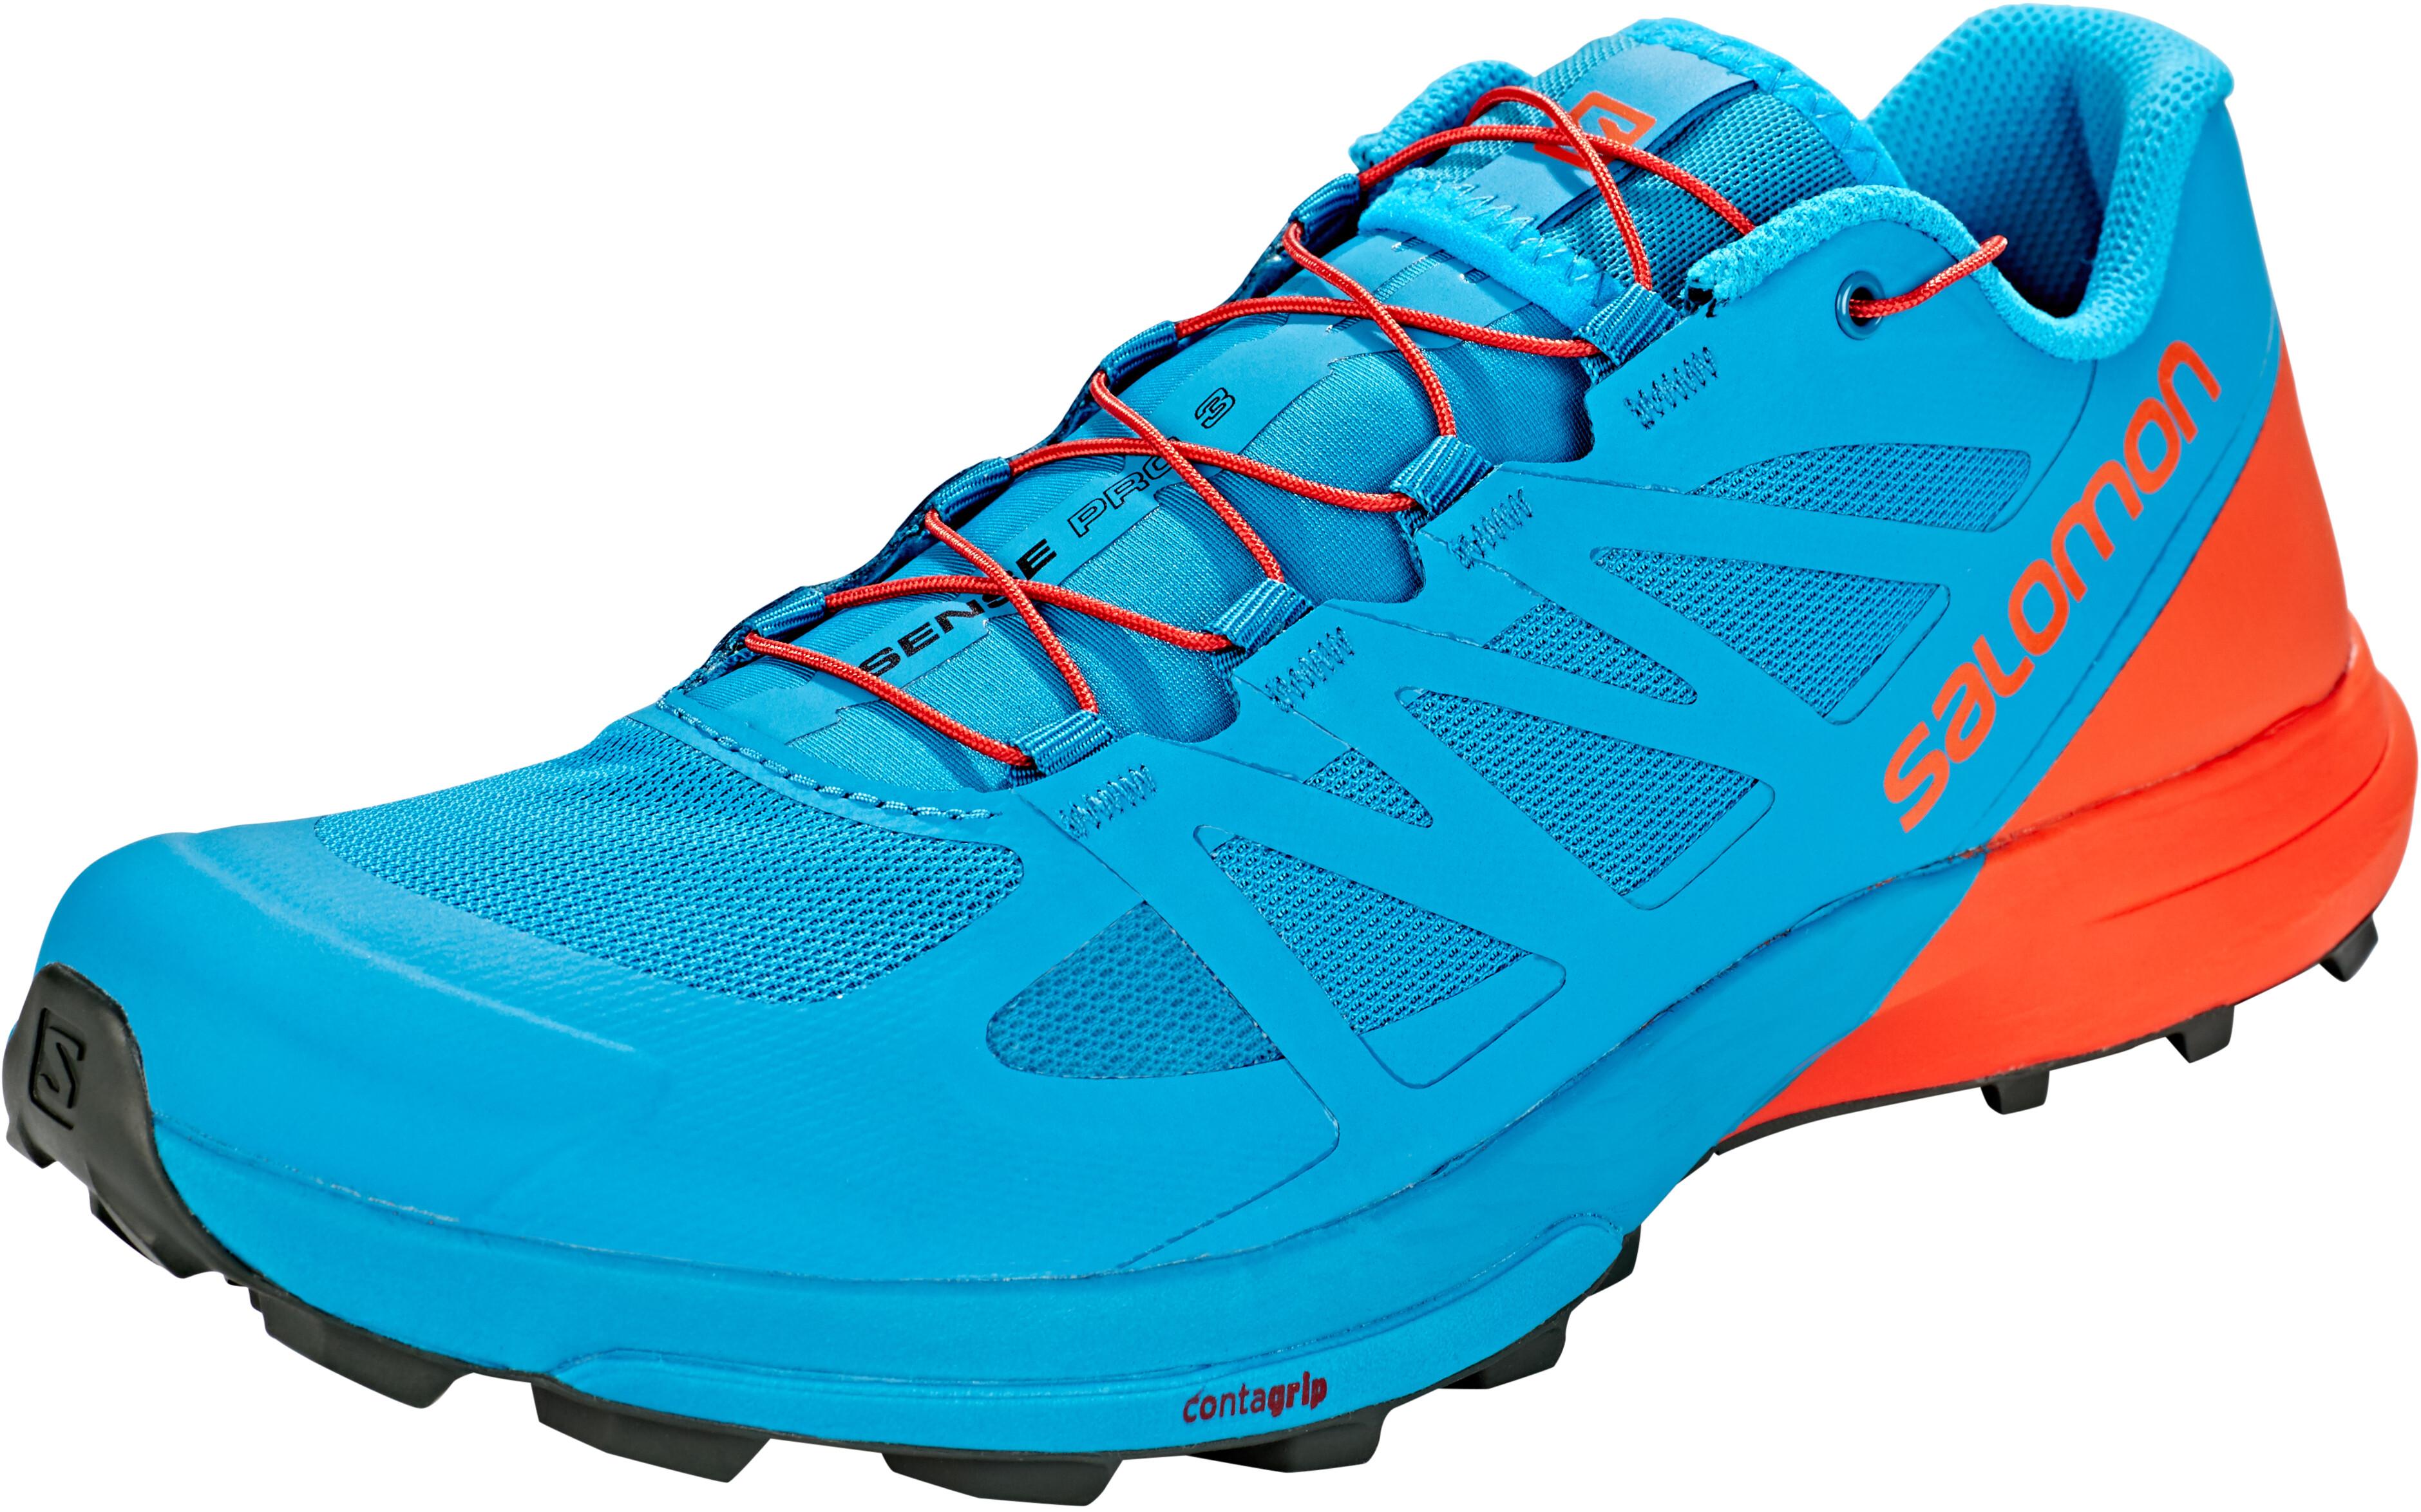 competitive price 53f01 a1d55 Salomon Sense Pro 3 Shoes Men fjord blue/cherry tomato/urban chic